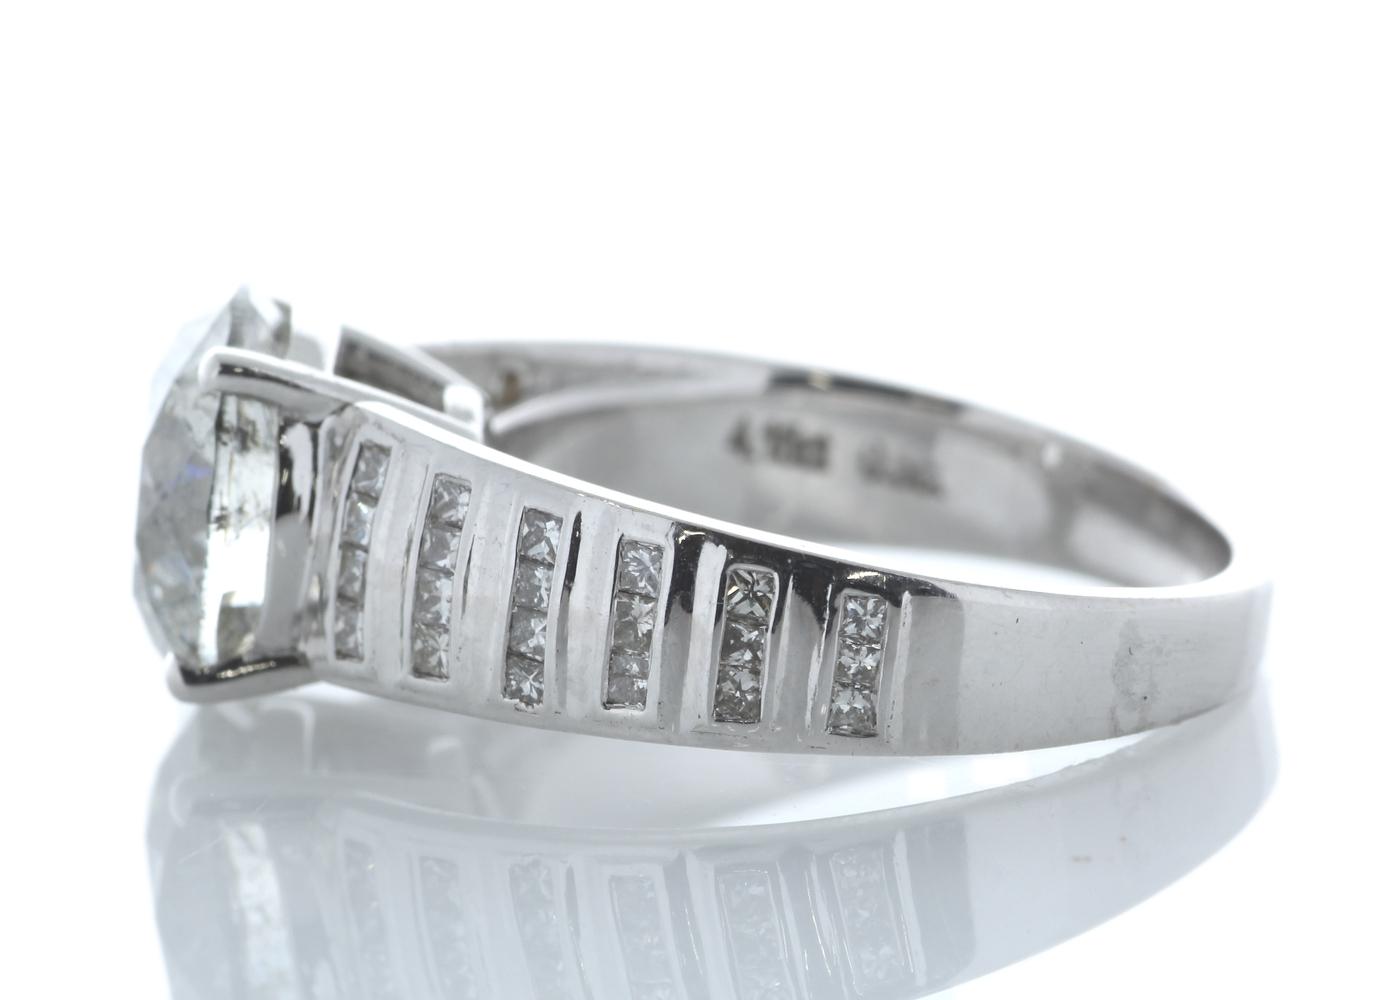 18ct White Gold Single Stone Prong Set With Stone Set Shoulders Diamond Ring 4.65 Carats - Image 4 of 5